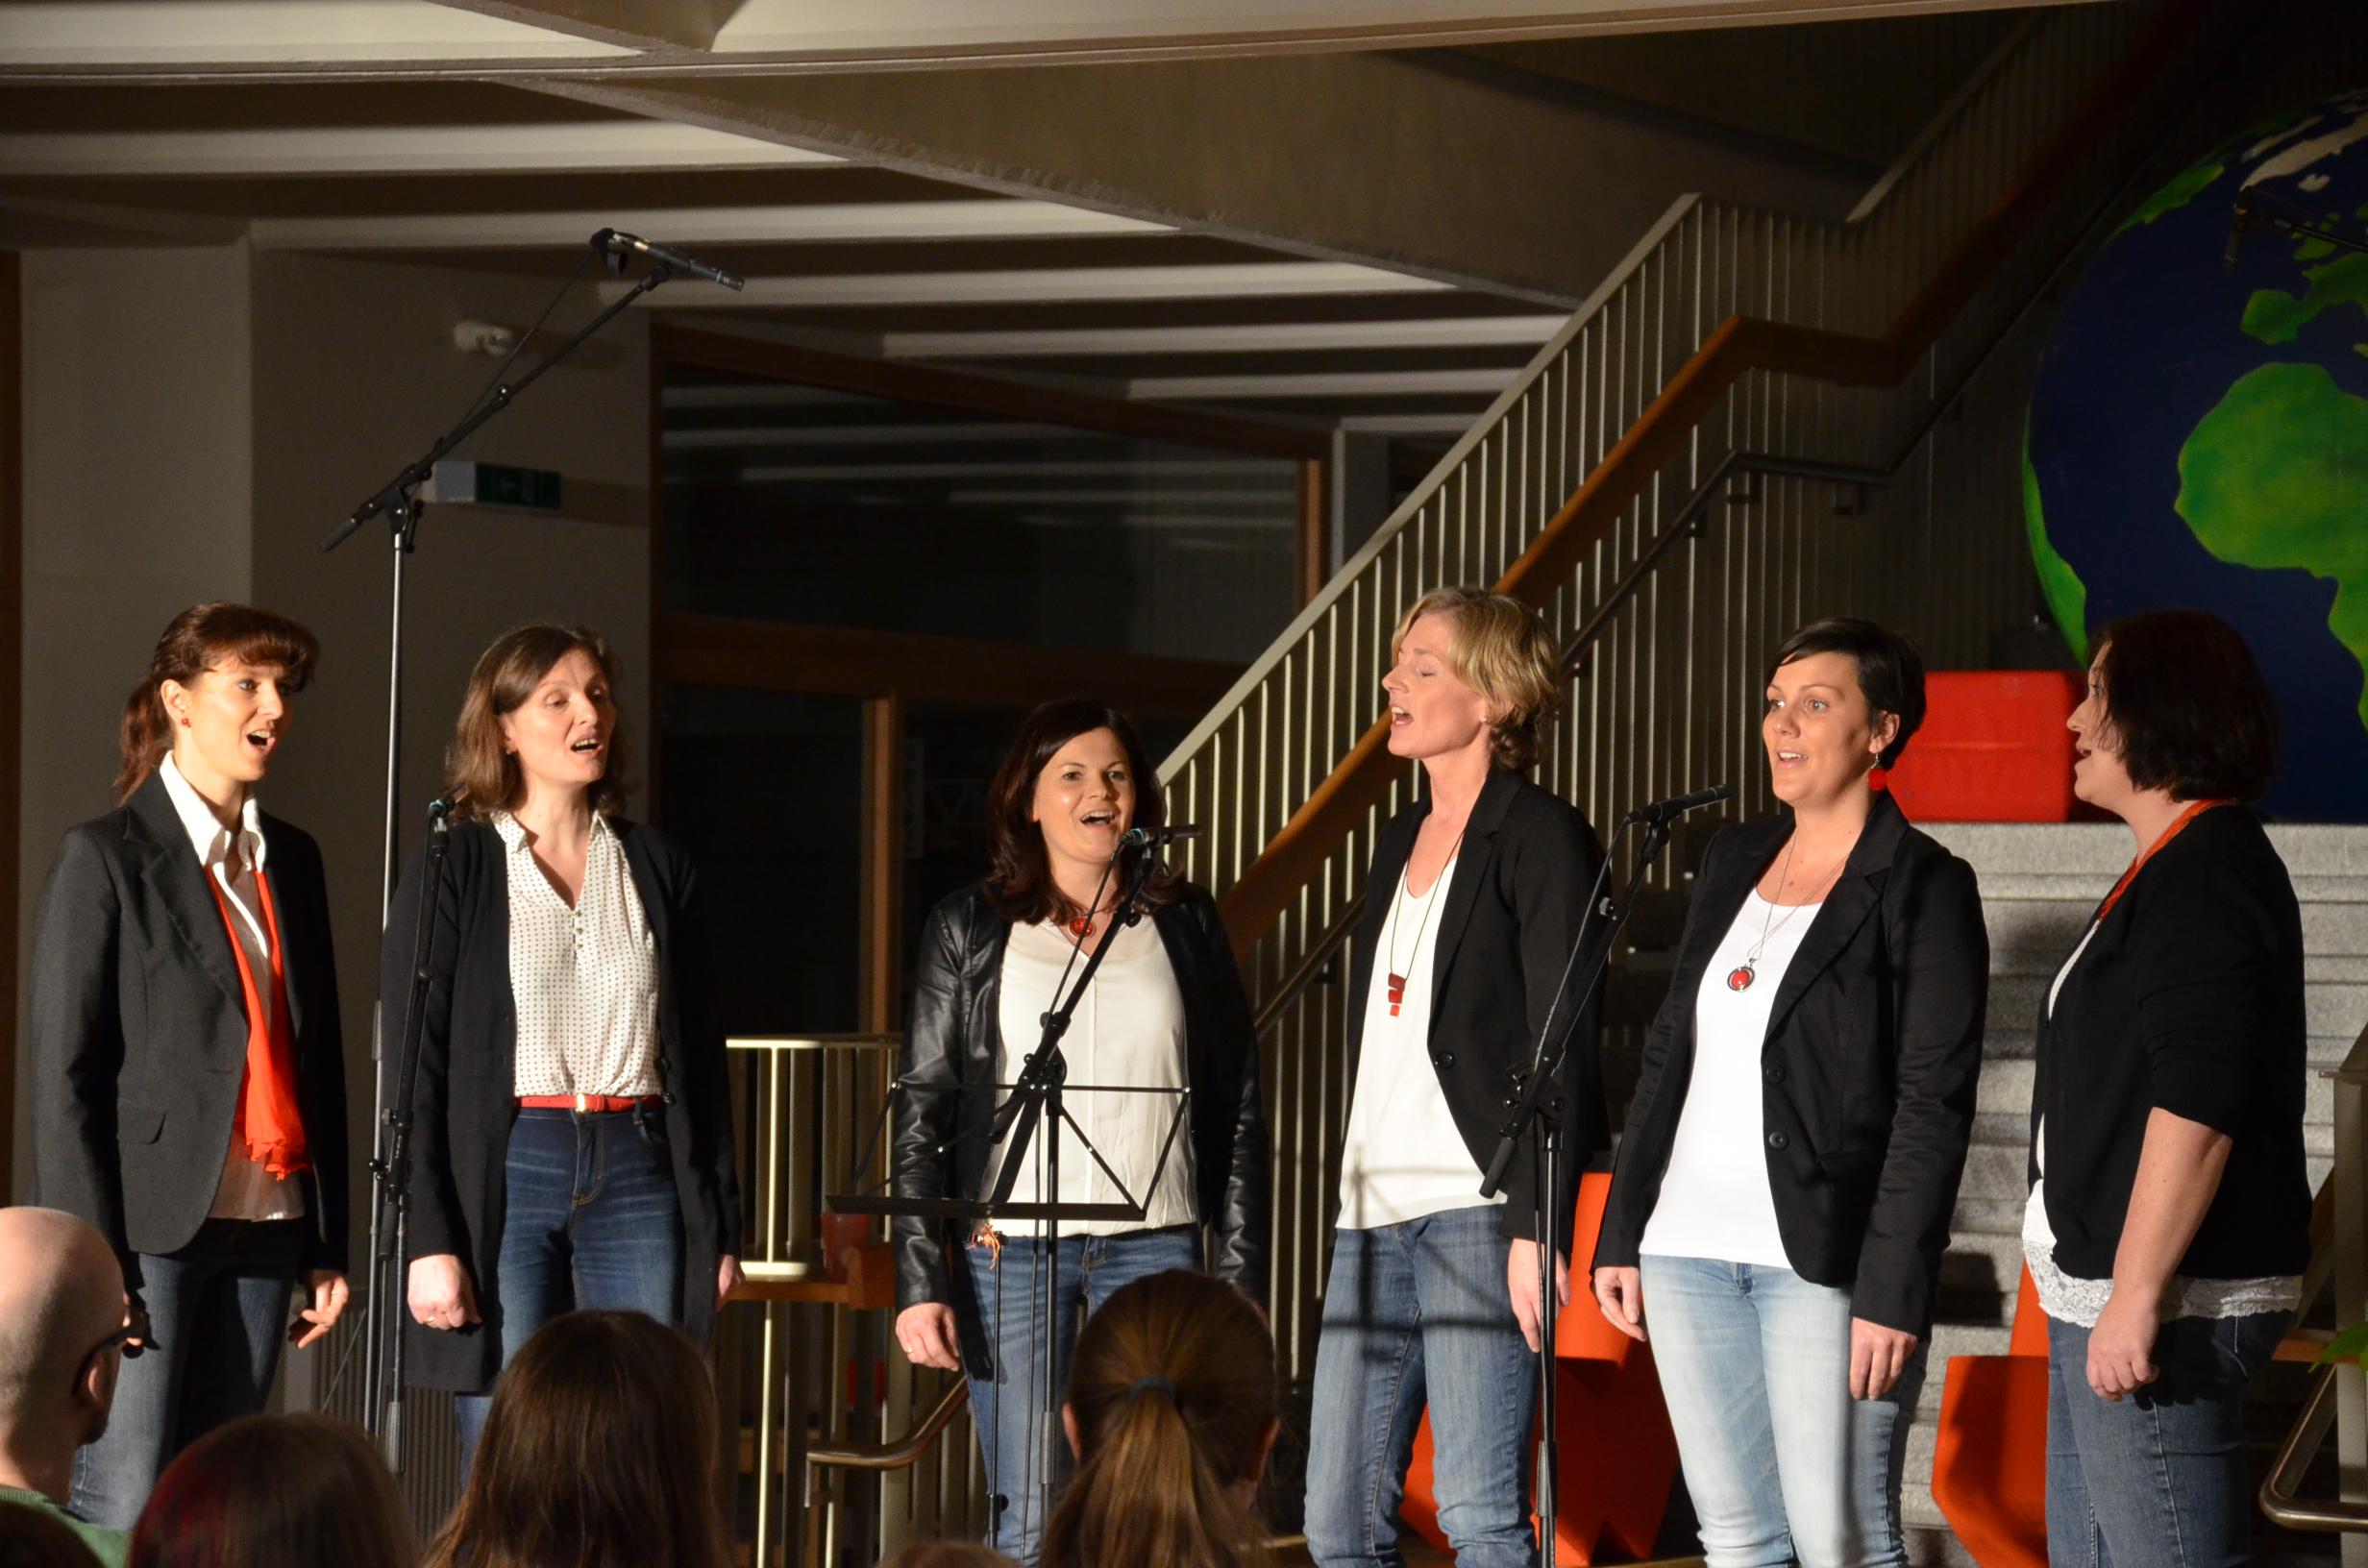 Eisenkappel-vellach singles und umgebung: Neu leute